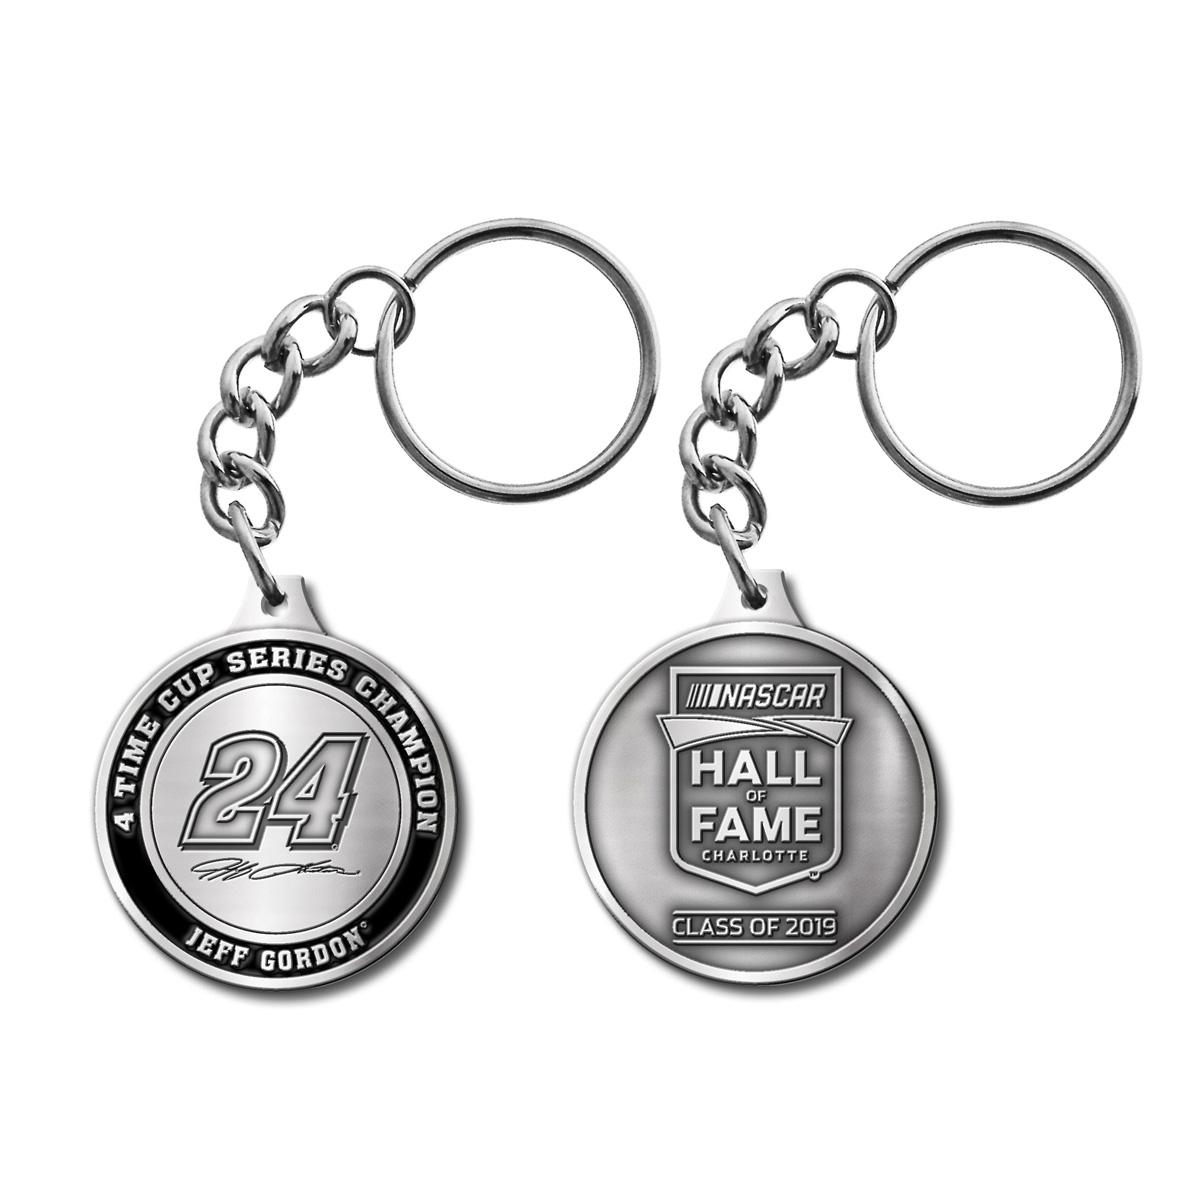 Jeff Gordon Store Exclusive 2019 NASCAR Hall of Fame Premium Pewter Keychain